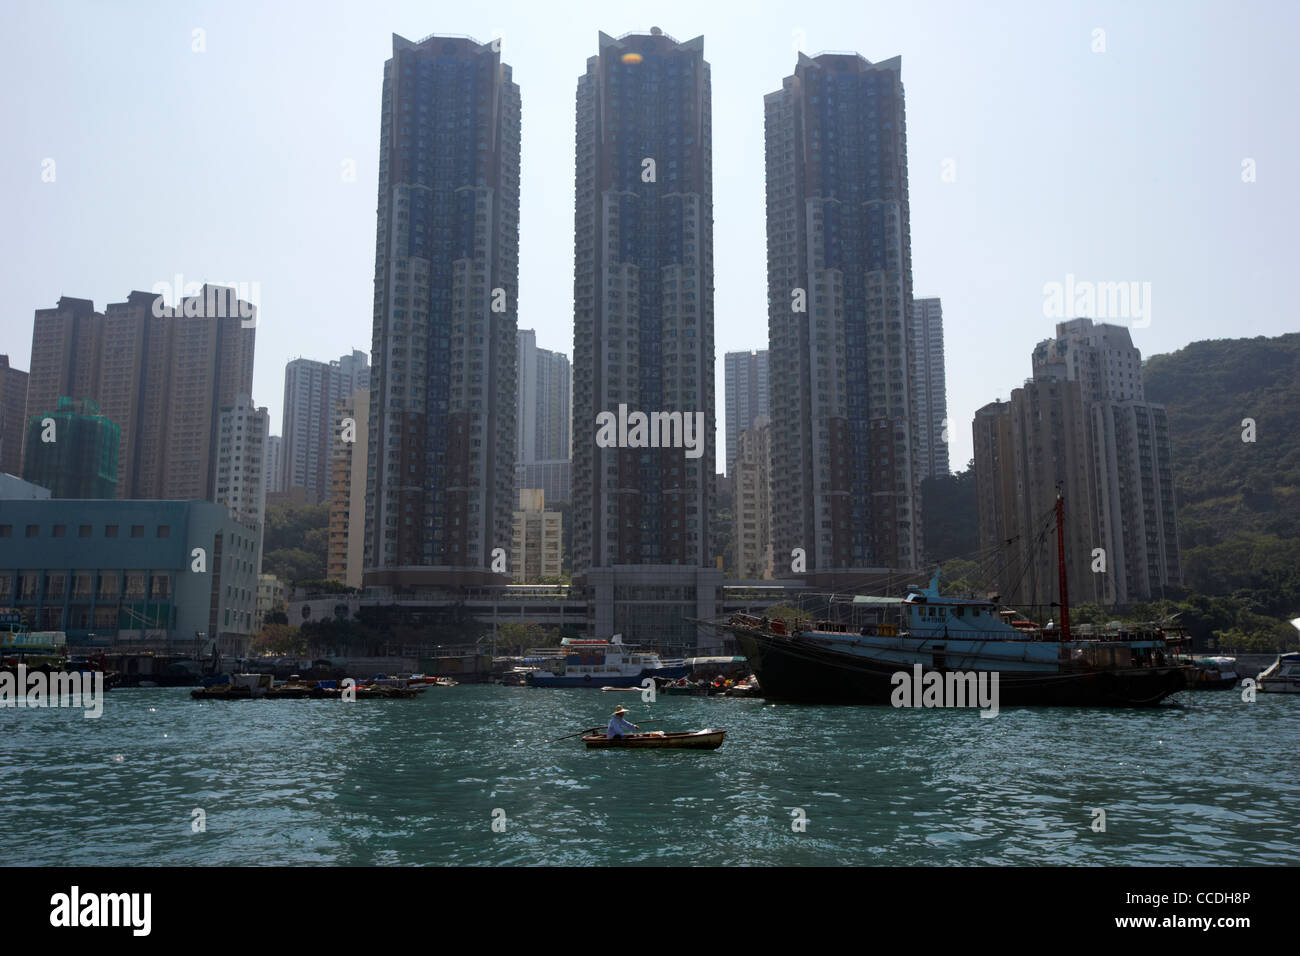 silhouette of marina habitat towers on ap lei chau aberdeen harbour hong kong hksar china asia - Stock Image